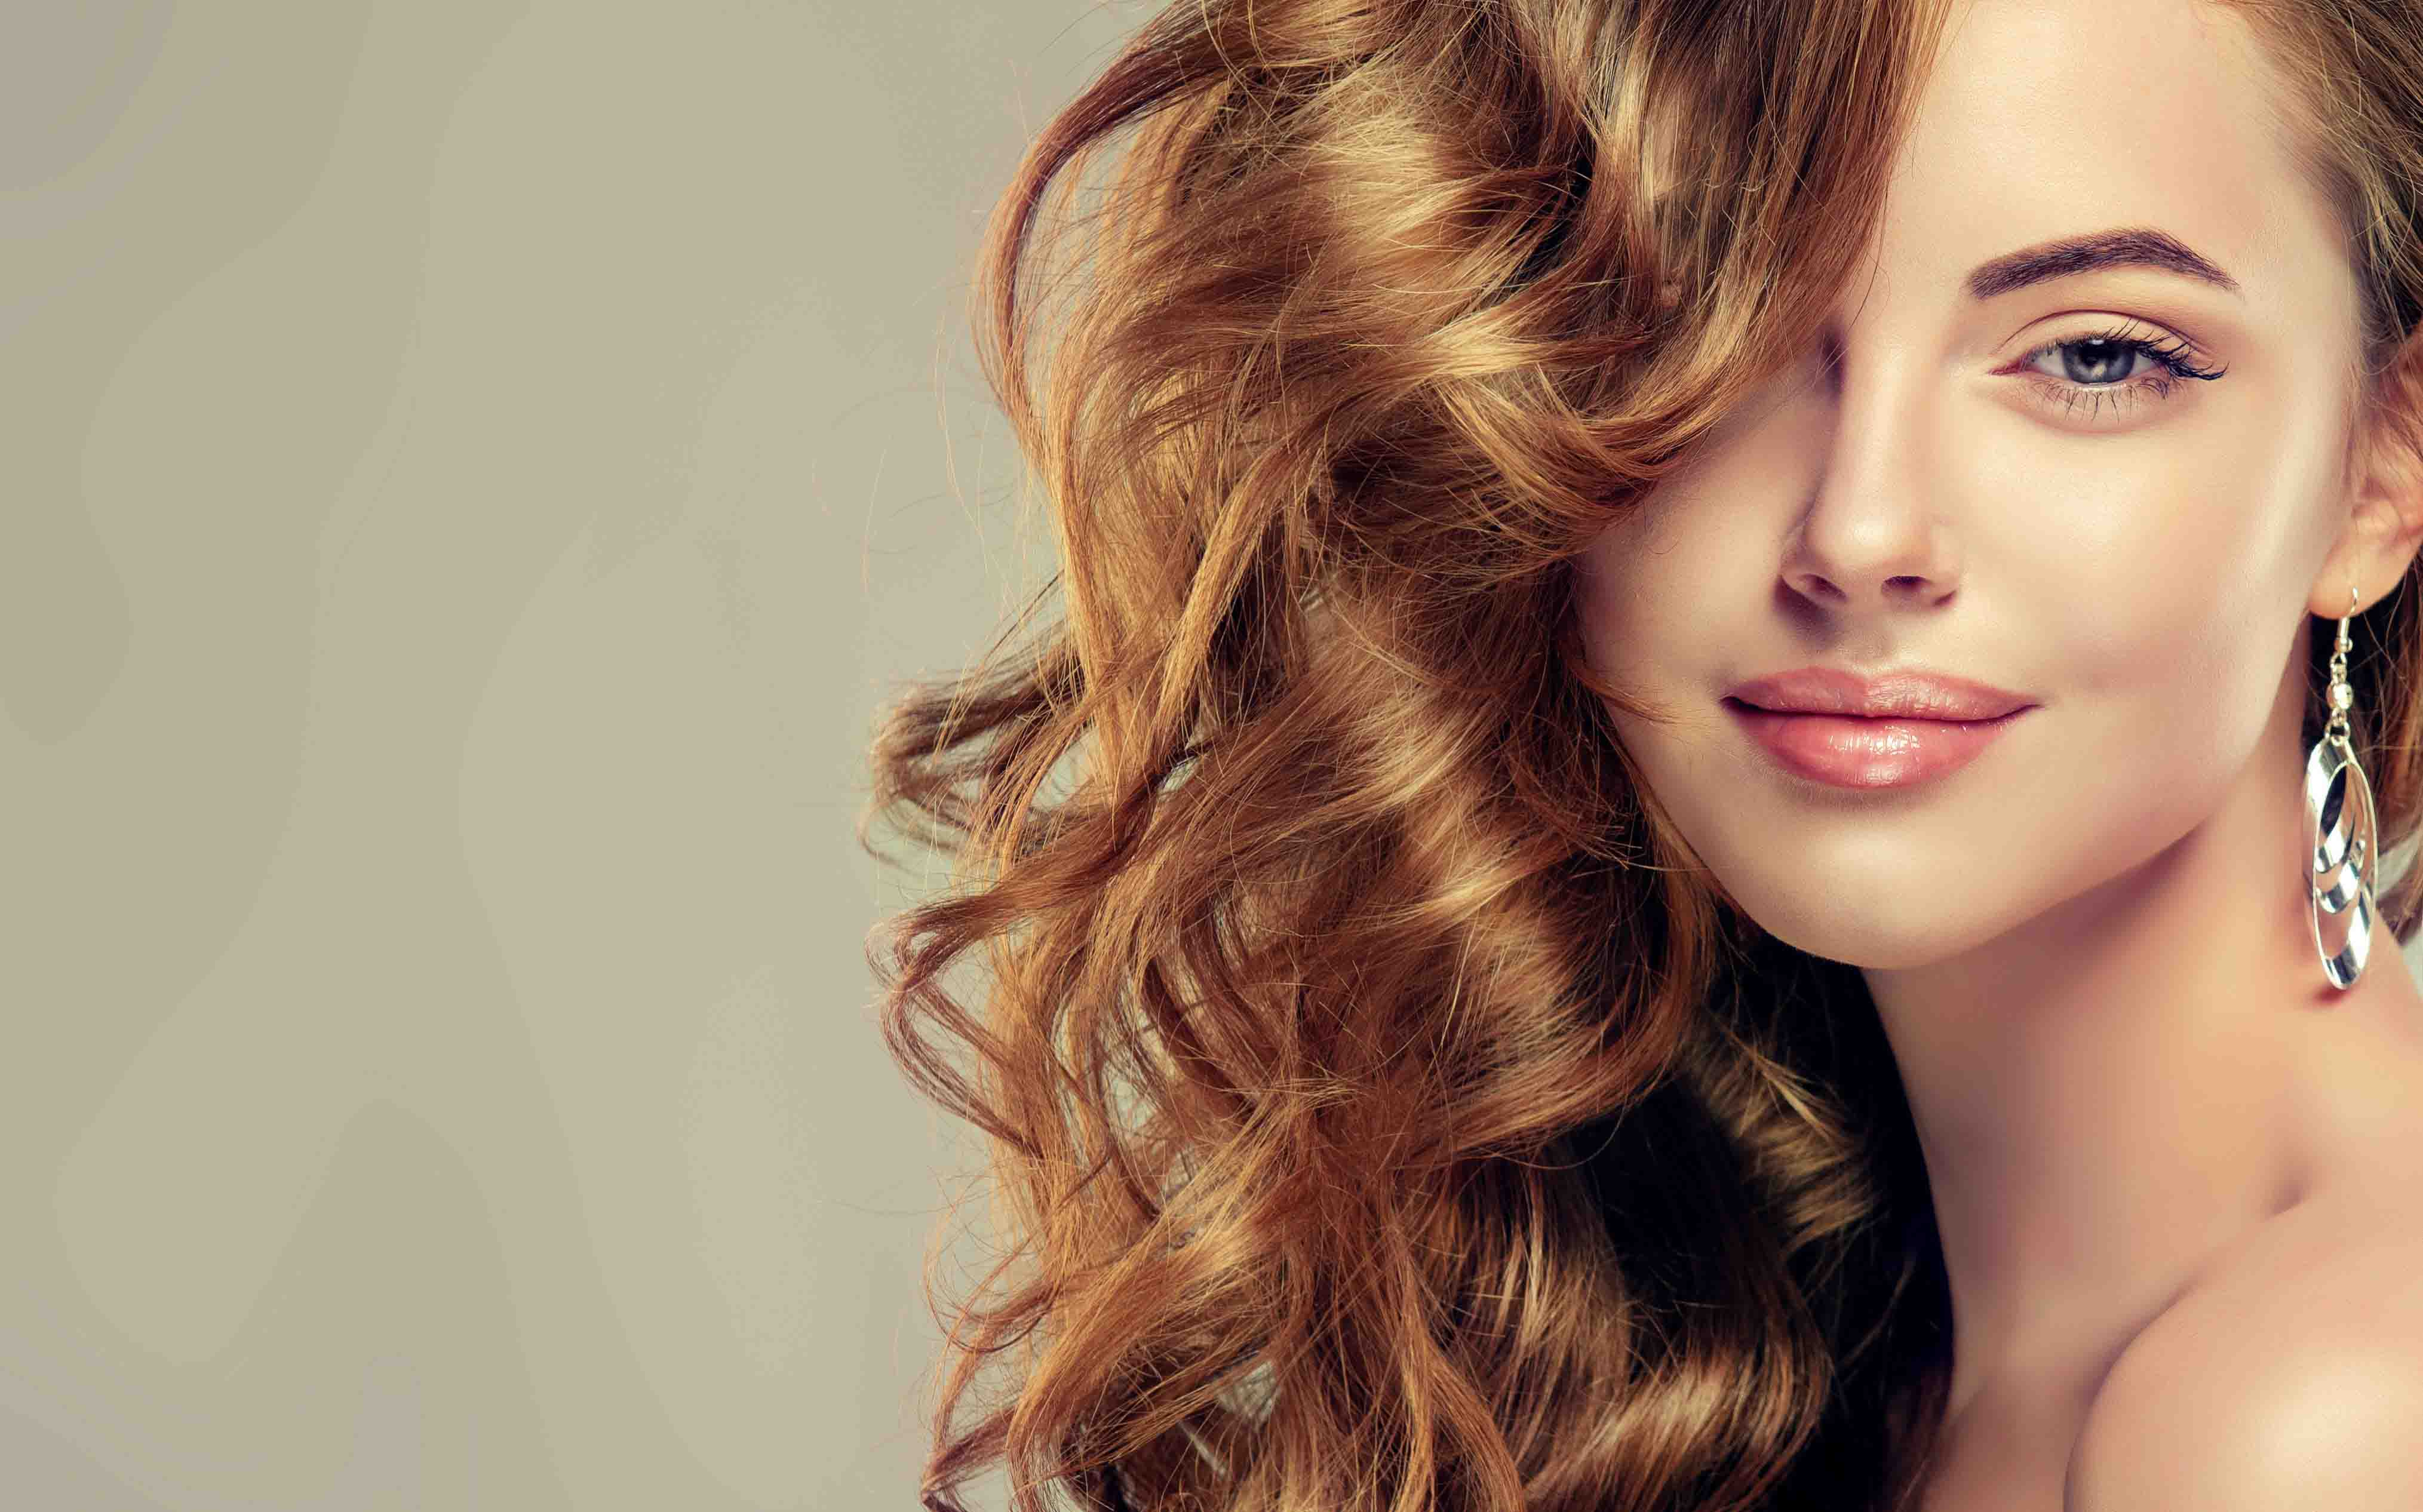 castano-trend-colore-estate-2020-zephir-parrucchieri-ascona-muralto